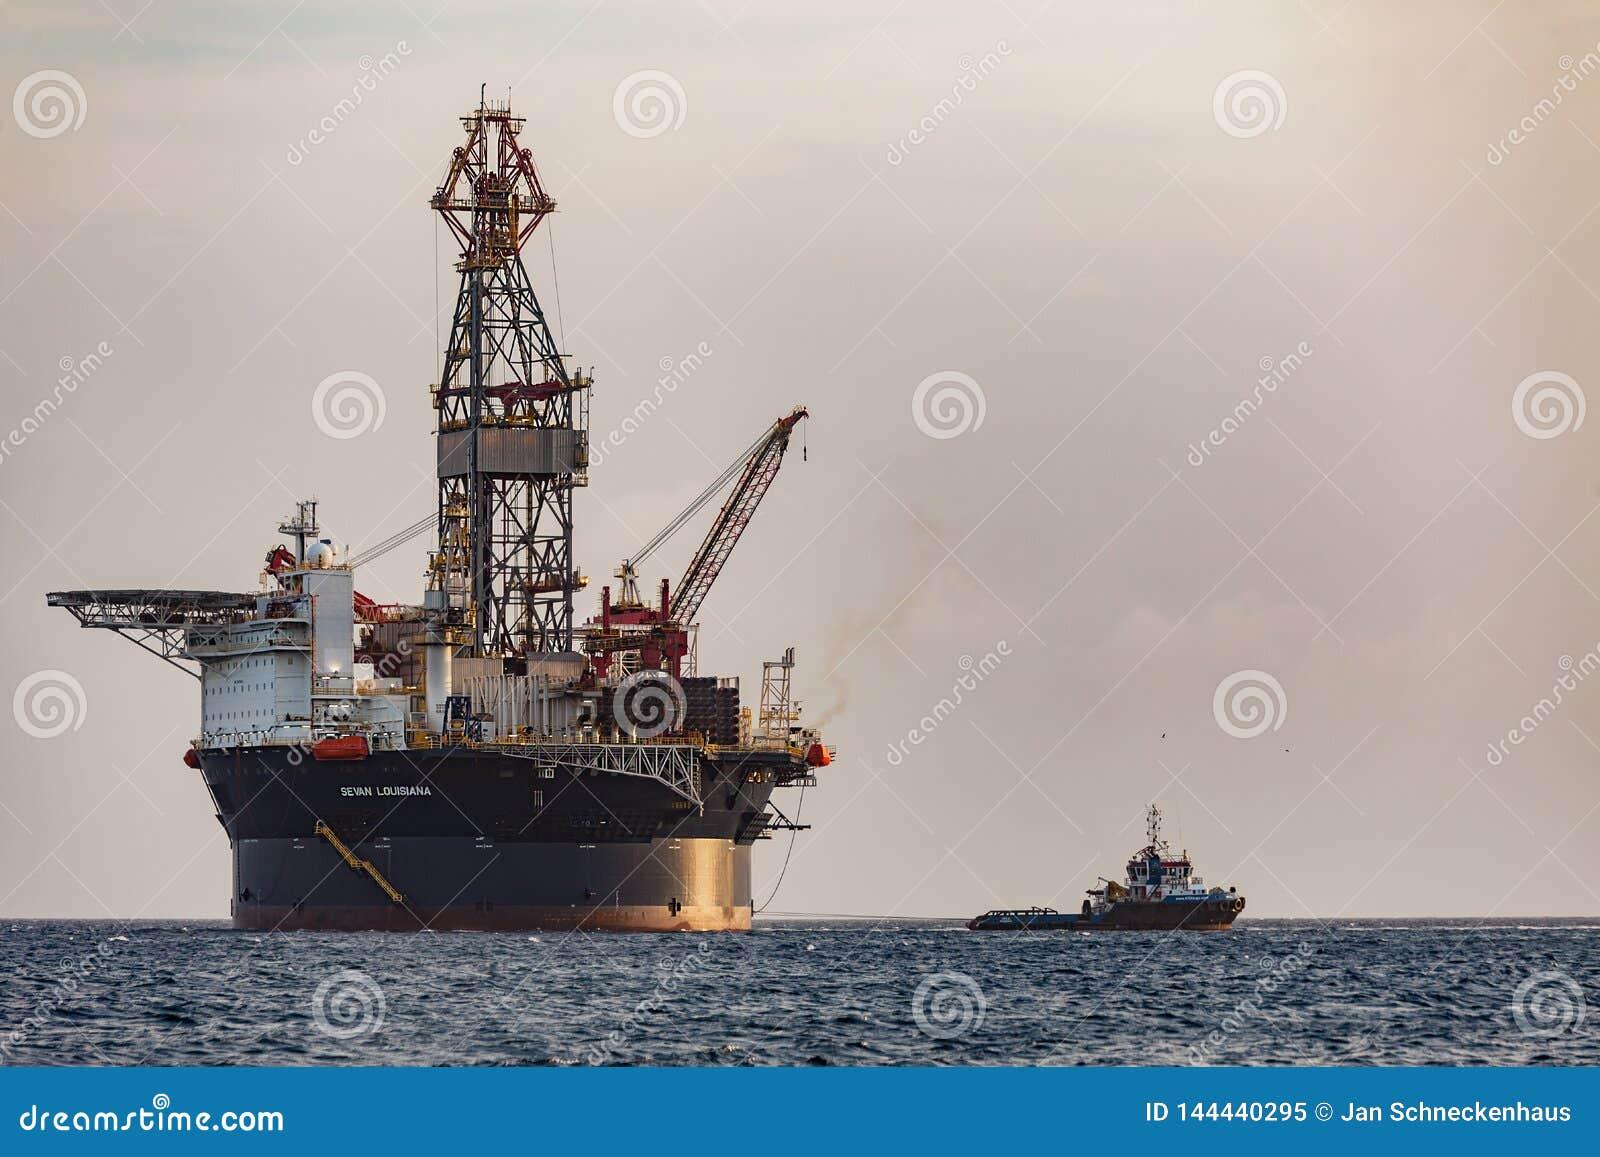 The Oil Rig `Sevan Louisiana` Off The Curacao Coast In The